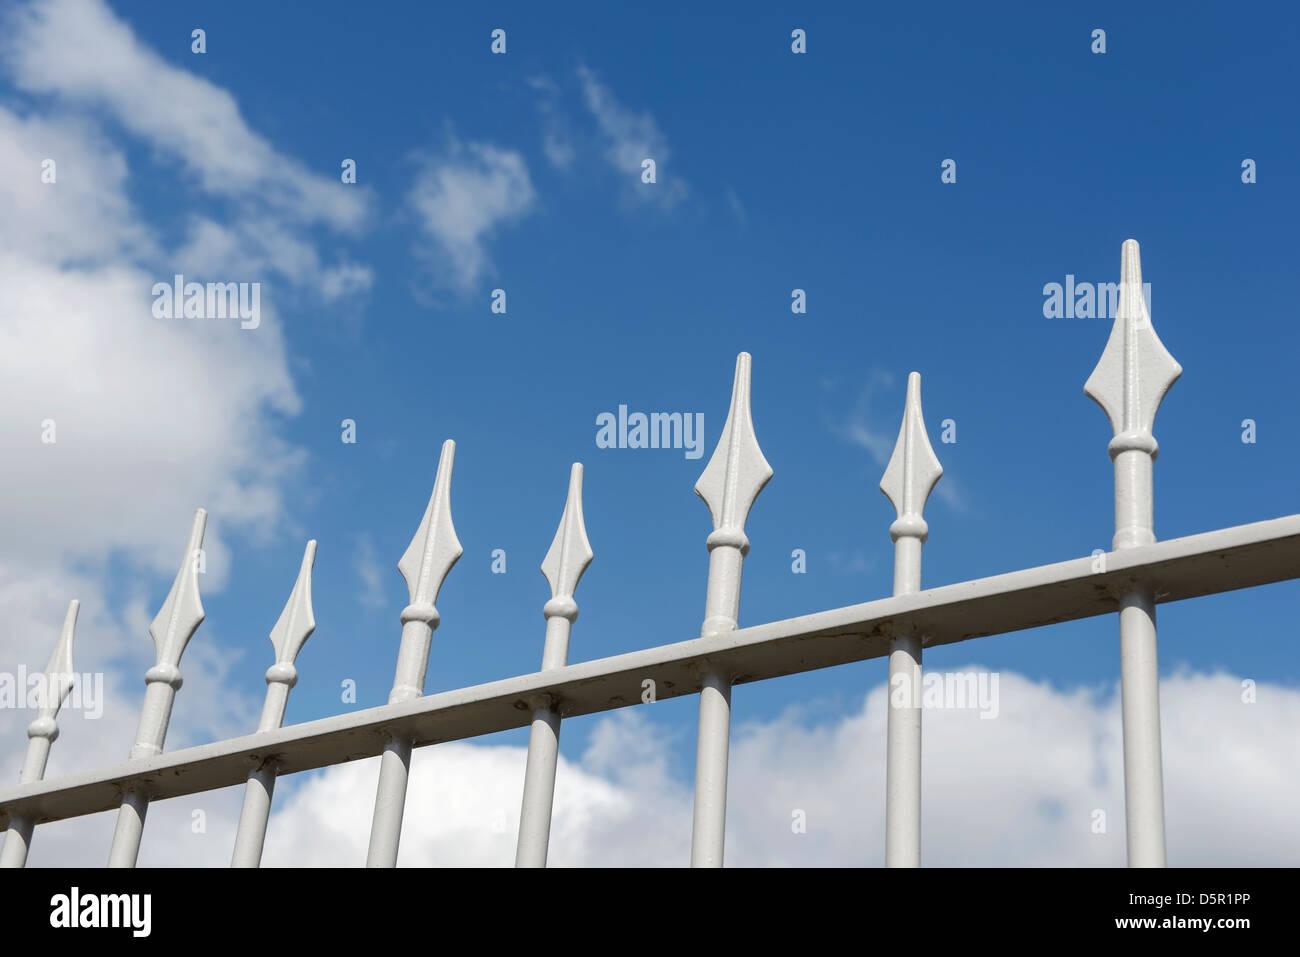 Metal railing spikes - Stock Image